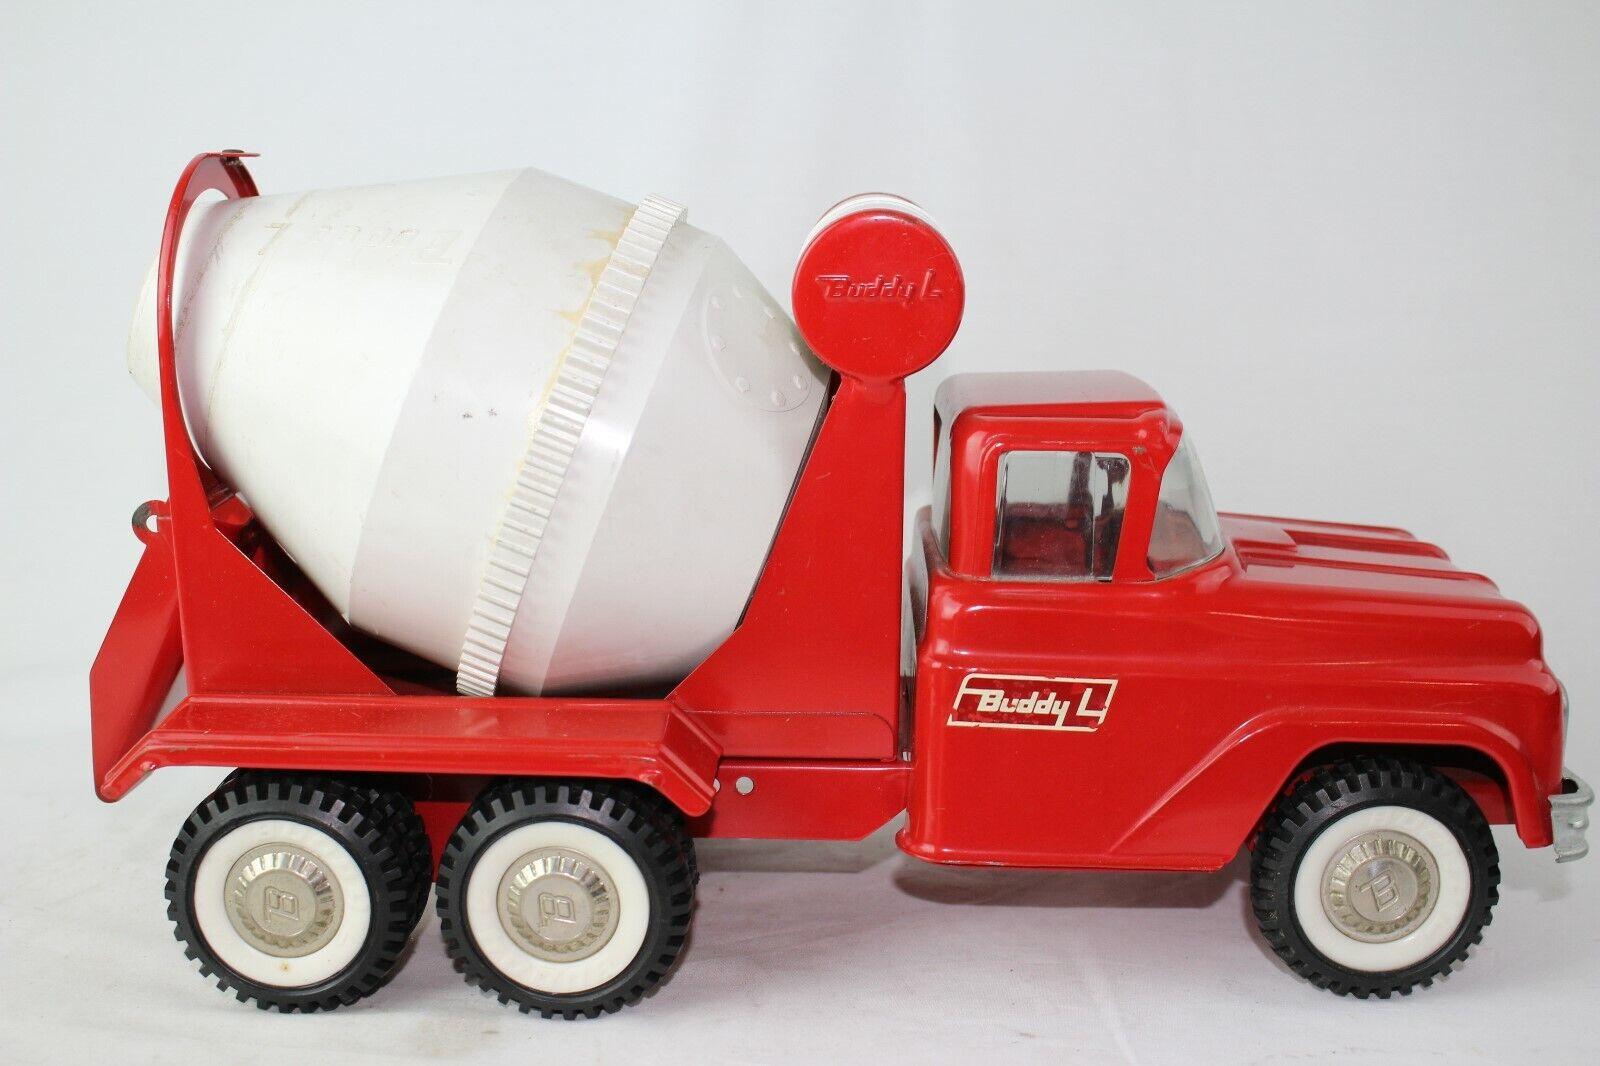 1960's Buddy L Ford Cement Mixer Truck, Nice Original